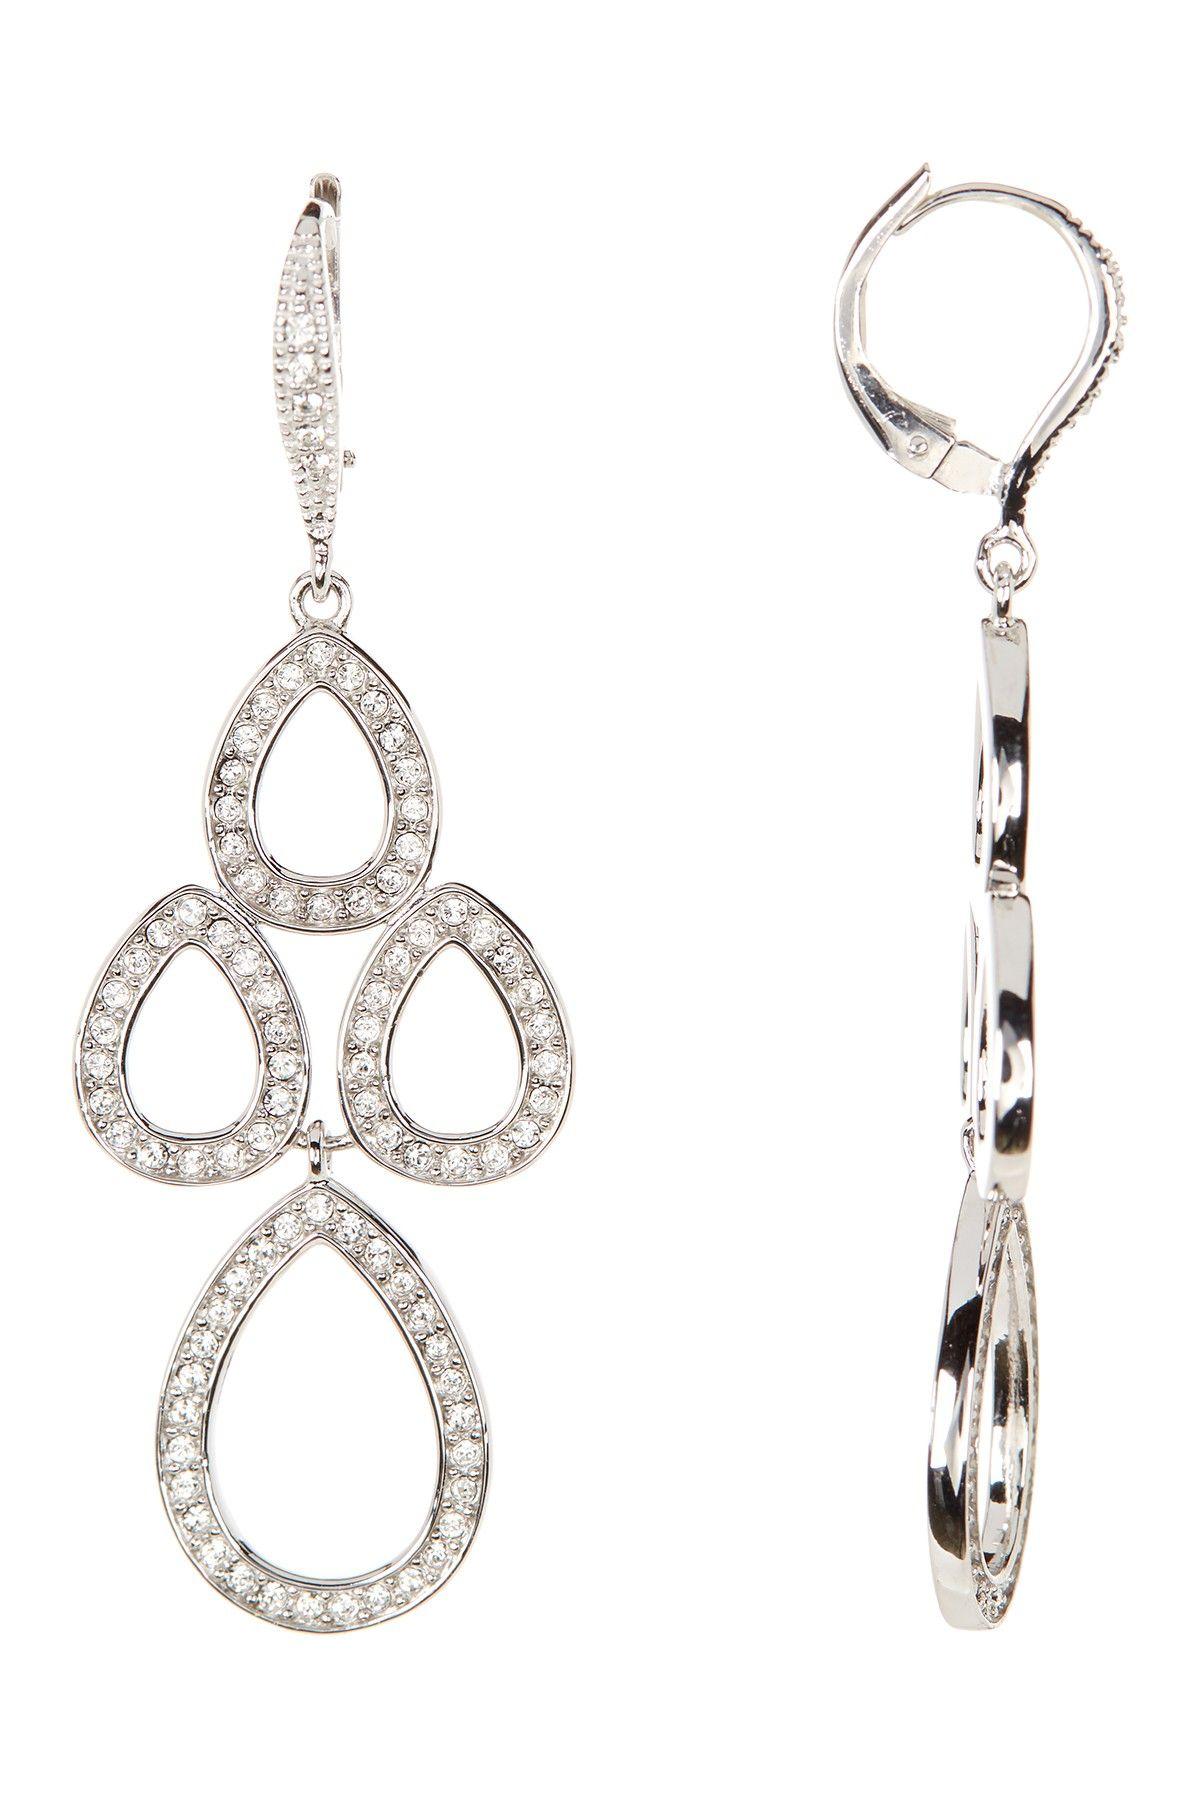 Crystal chandelier earrings chandelier earrings judith jack and judith jack crystal chandelier earrings nordstrom rack arubaitofo Choice Image